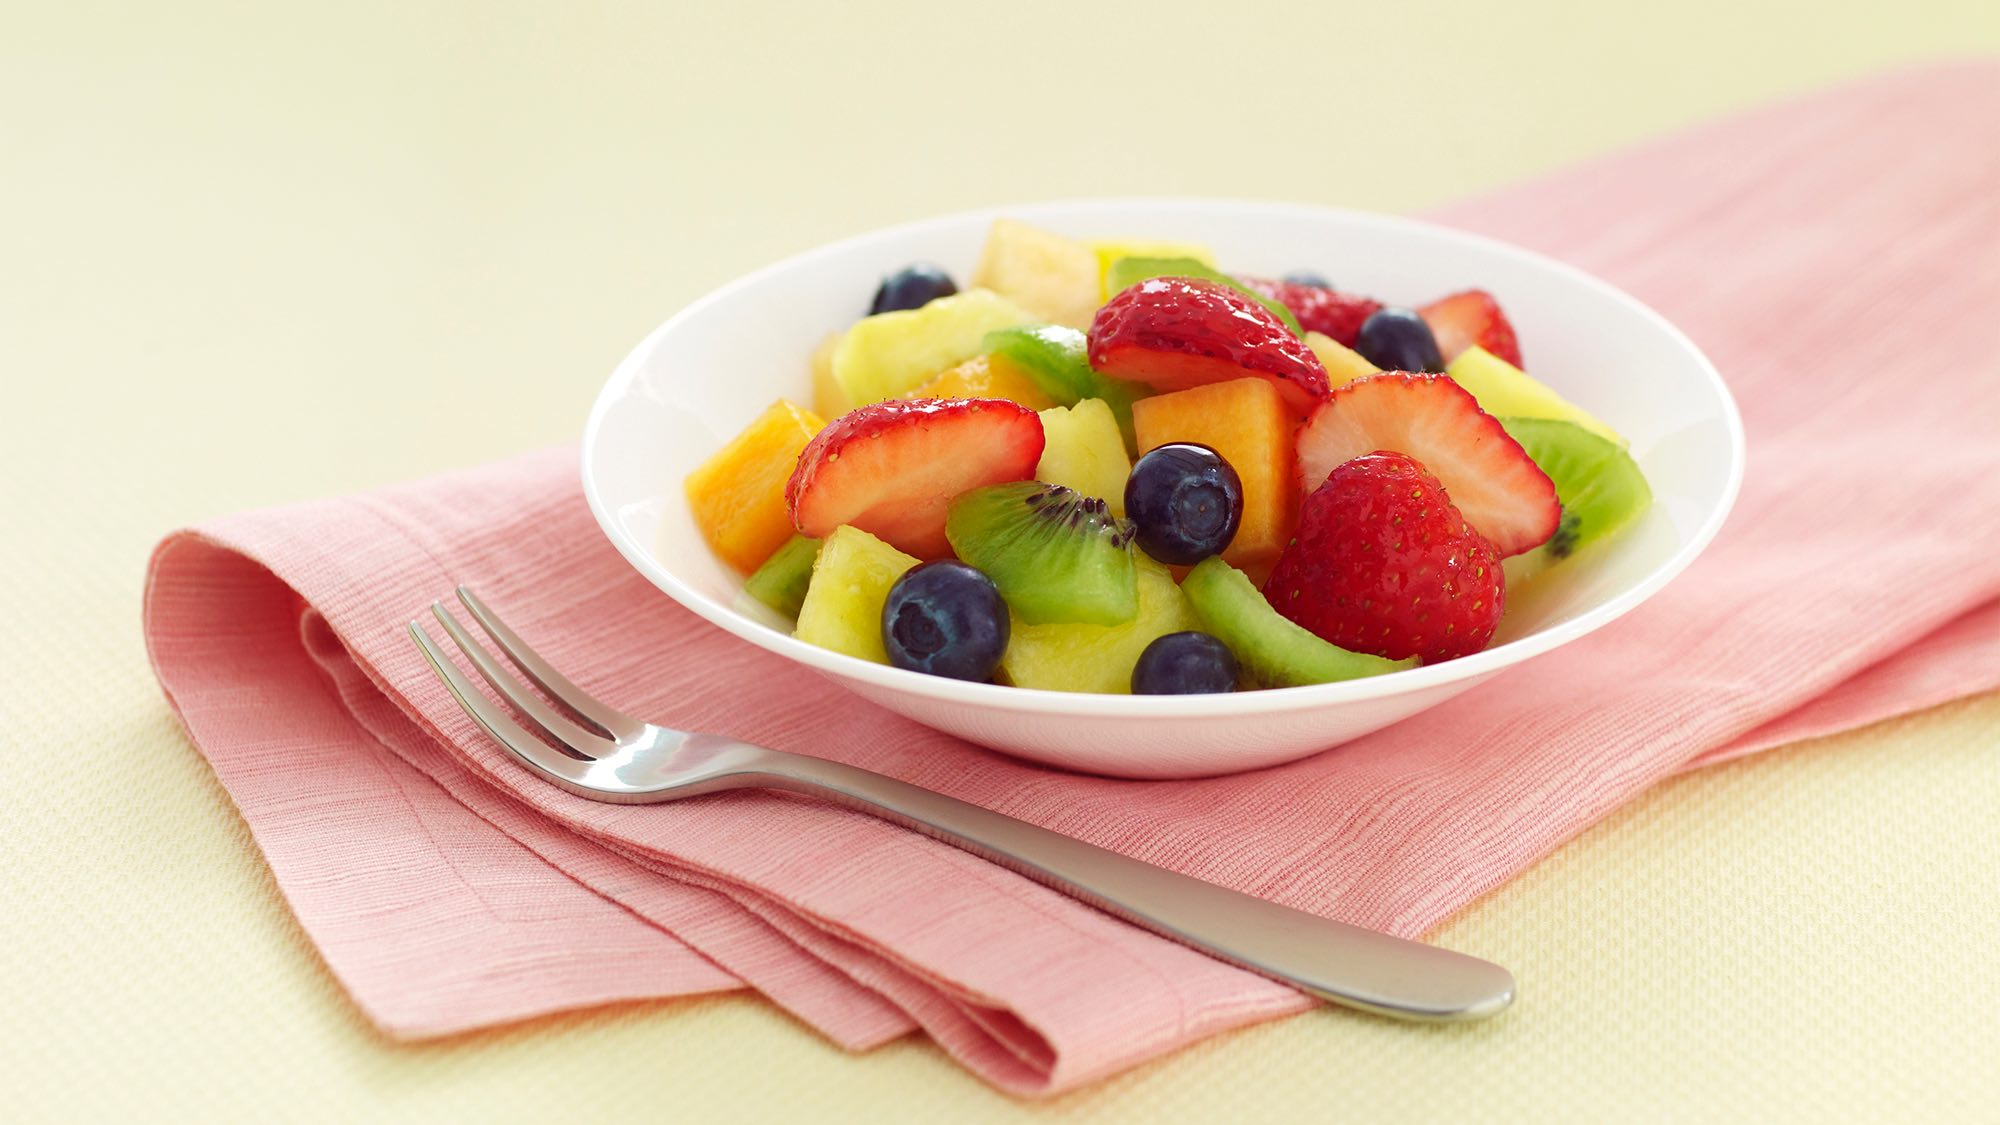 McCormick Very Vanilla Fruit Salad